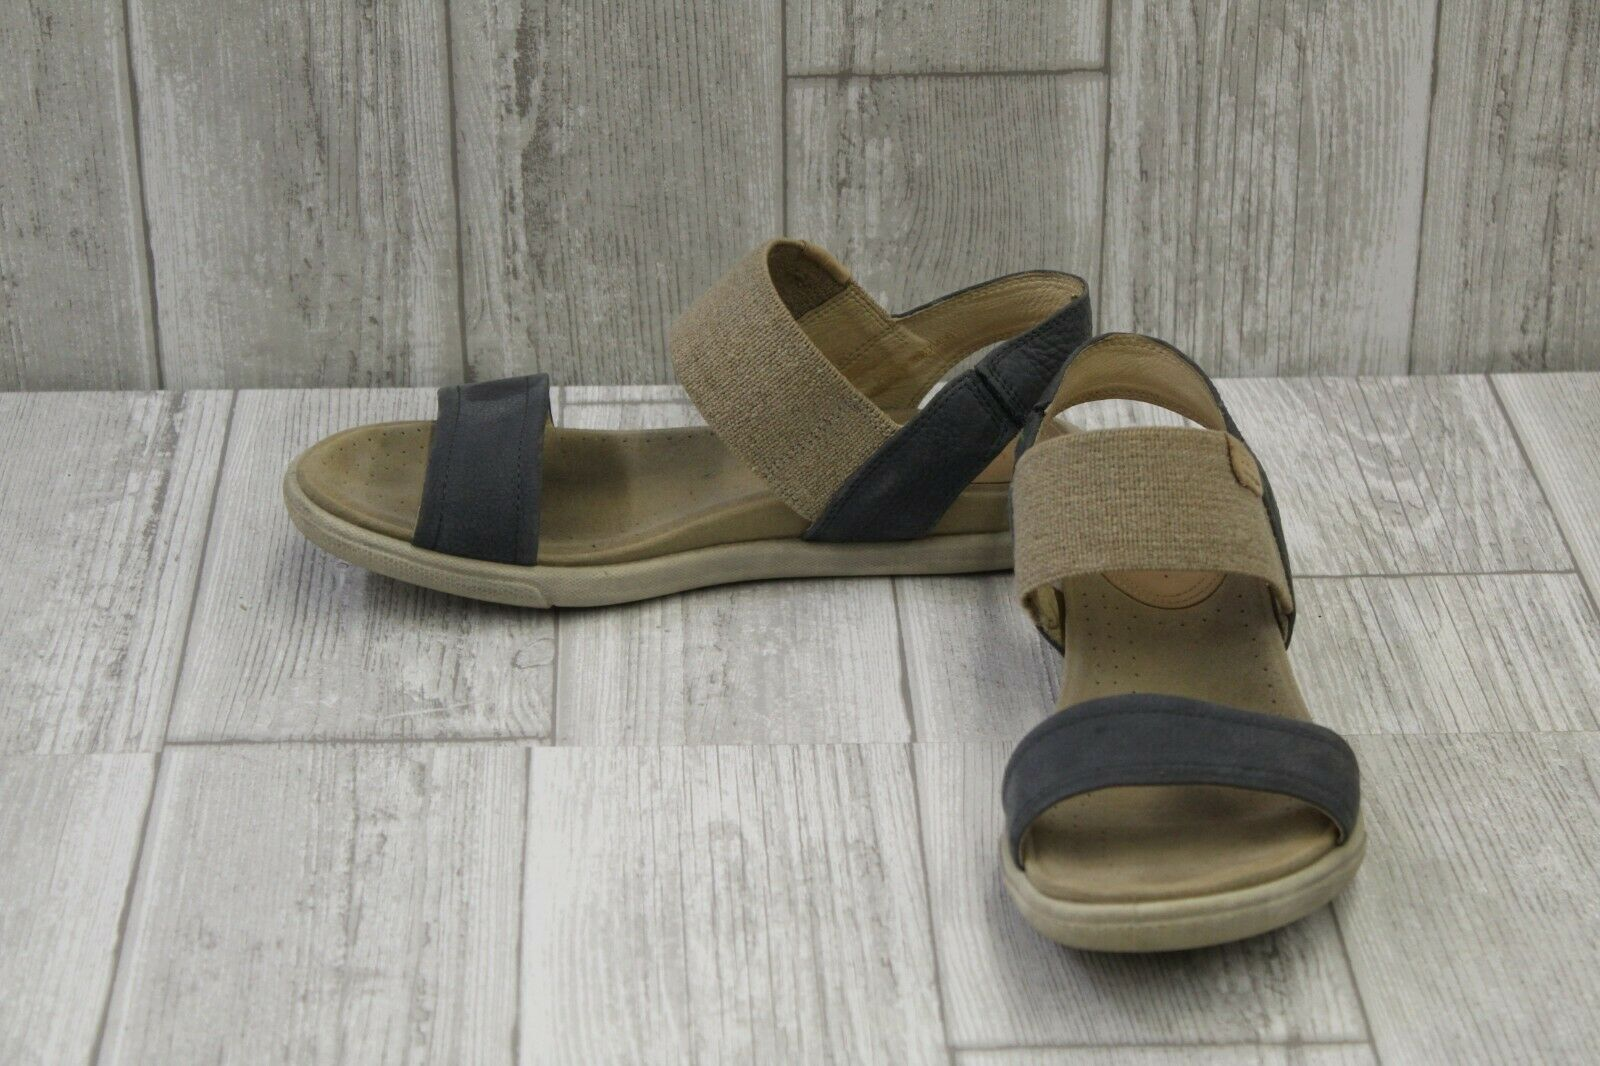 c98344dedf1a ECCO Women s Damara Ankle Gladiator Sandal Ombre powder 37 EU   6 ...